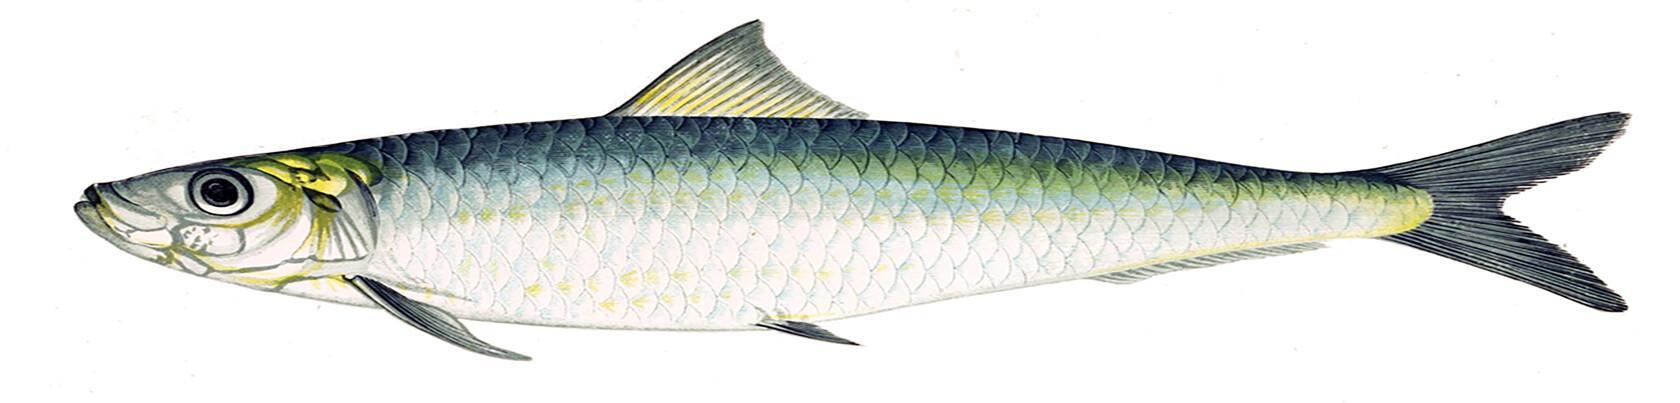 Molinari sardine Two Famous Marseille Expressions